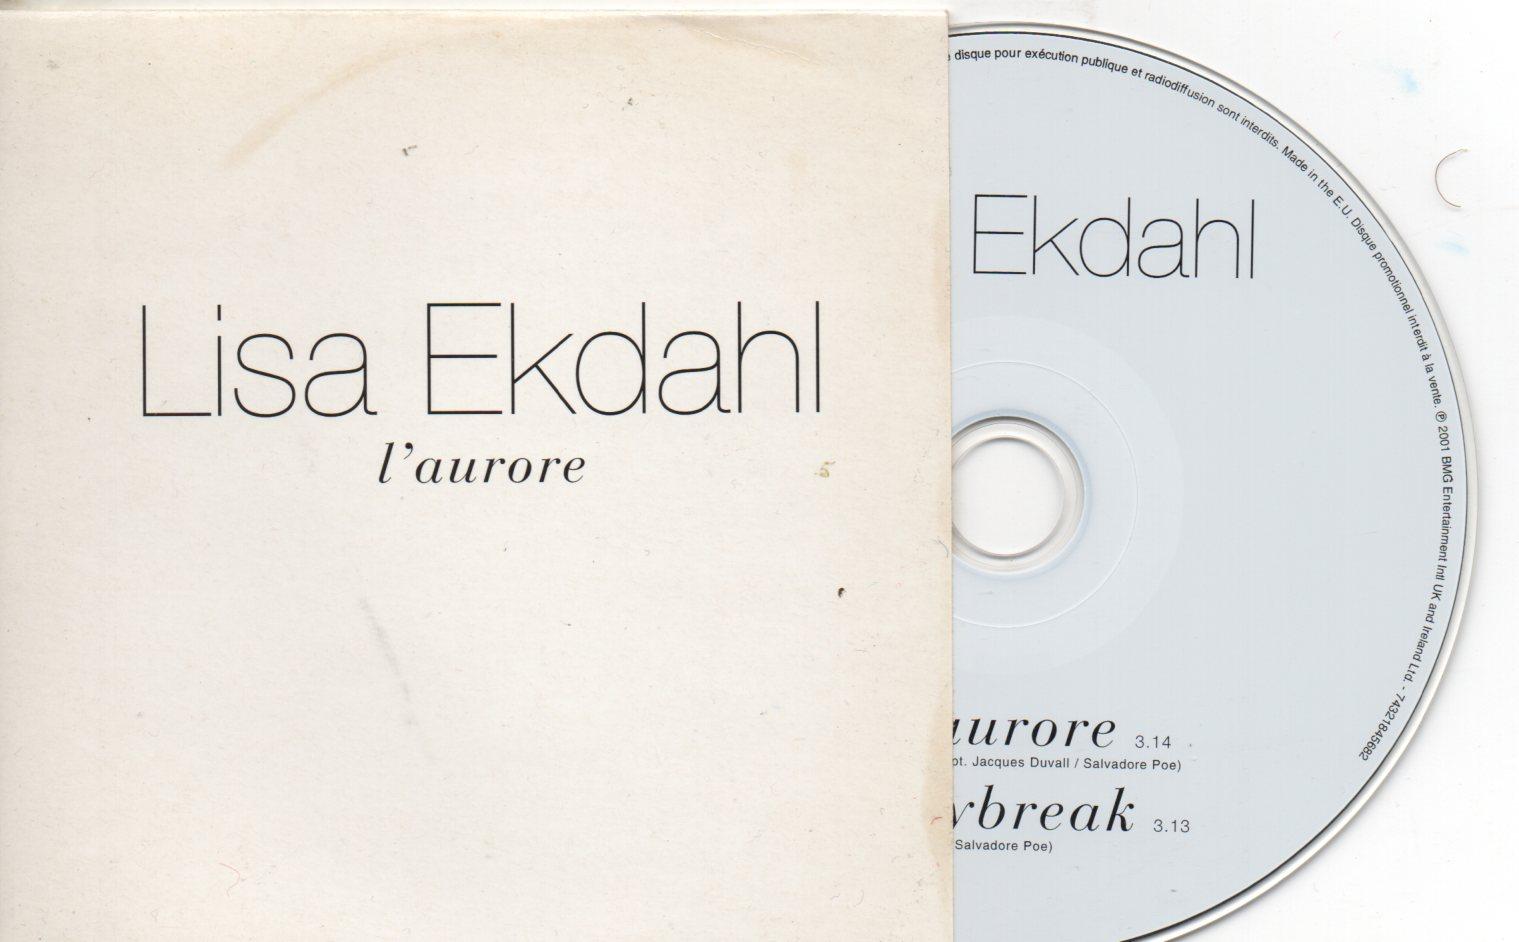 LISA EKDAHL - L'Aurore - Daybreak French Promo 2-track CARD SLEEVE - CD single